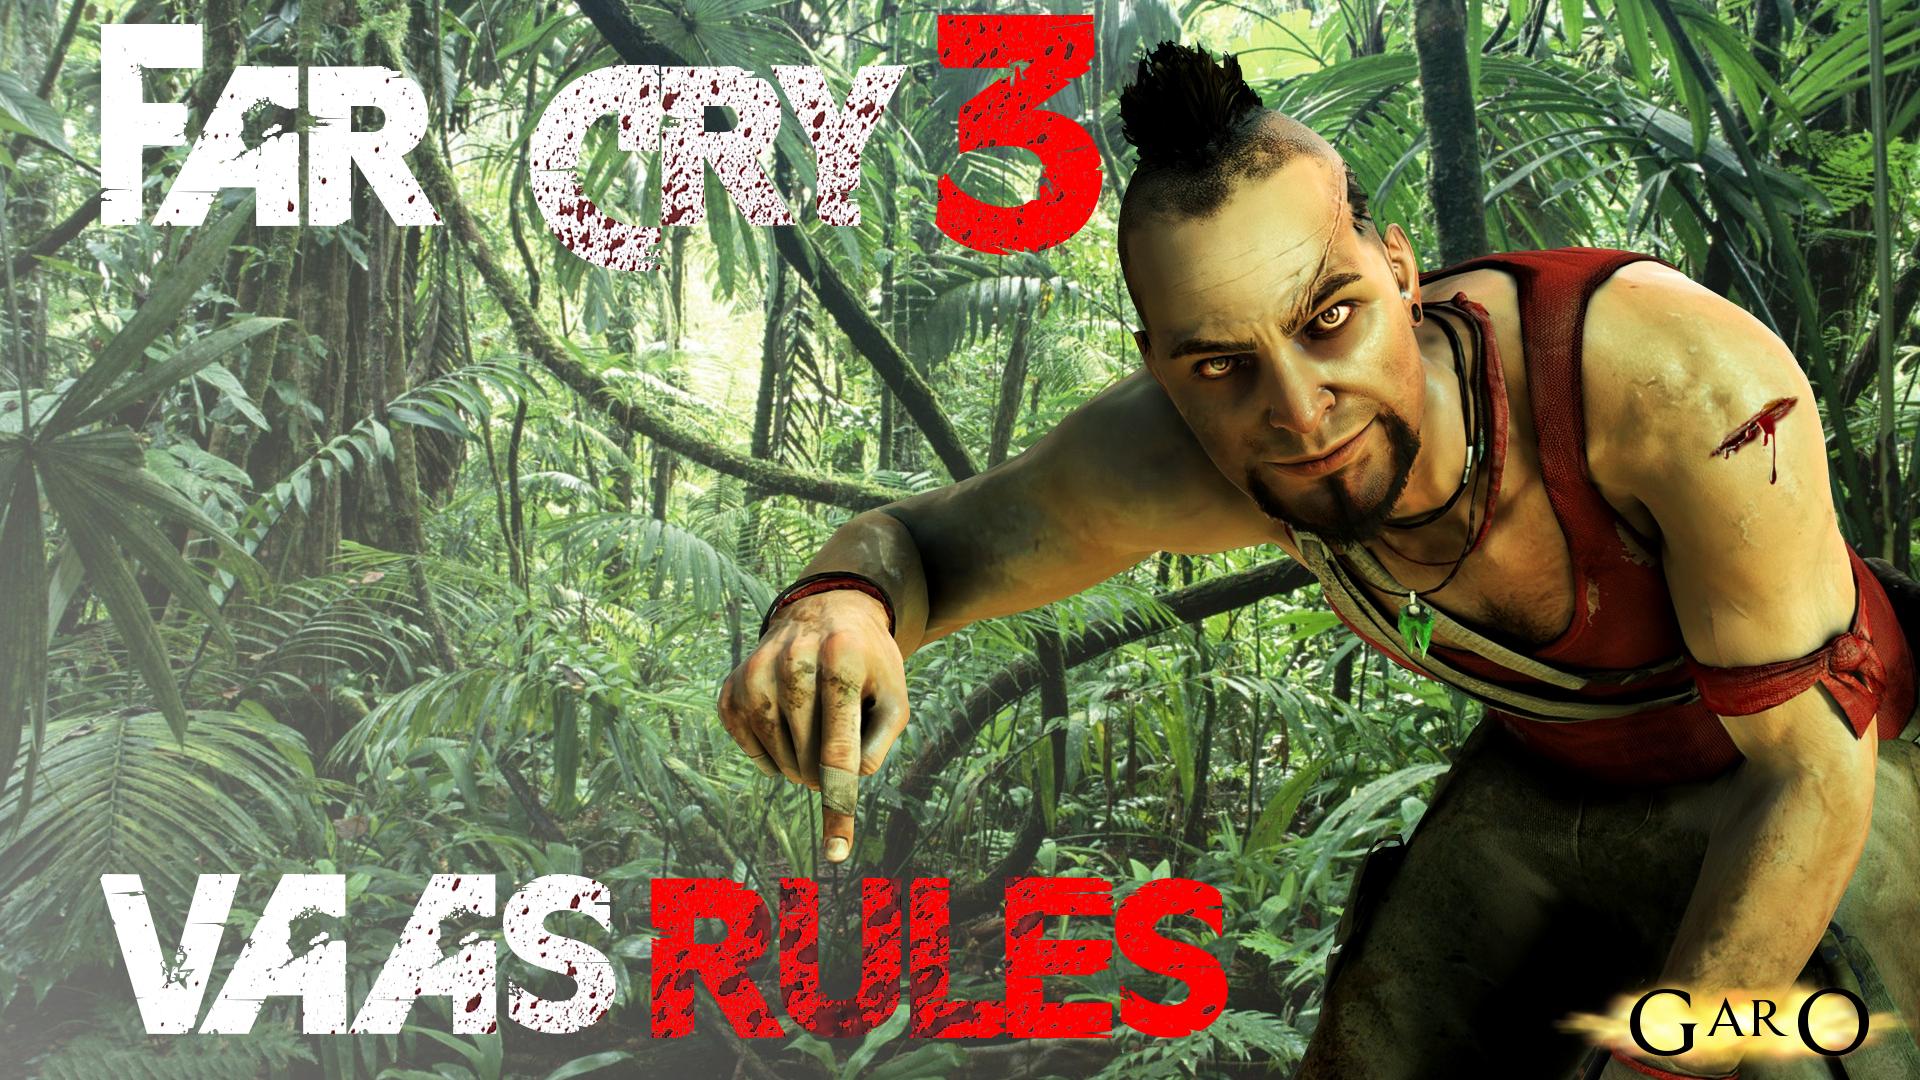 Far Cry 3 Wallpaper Vaas Rules By Garoarts On Deviantart